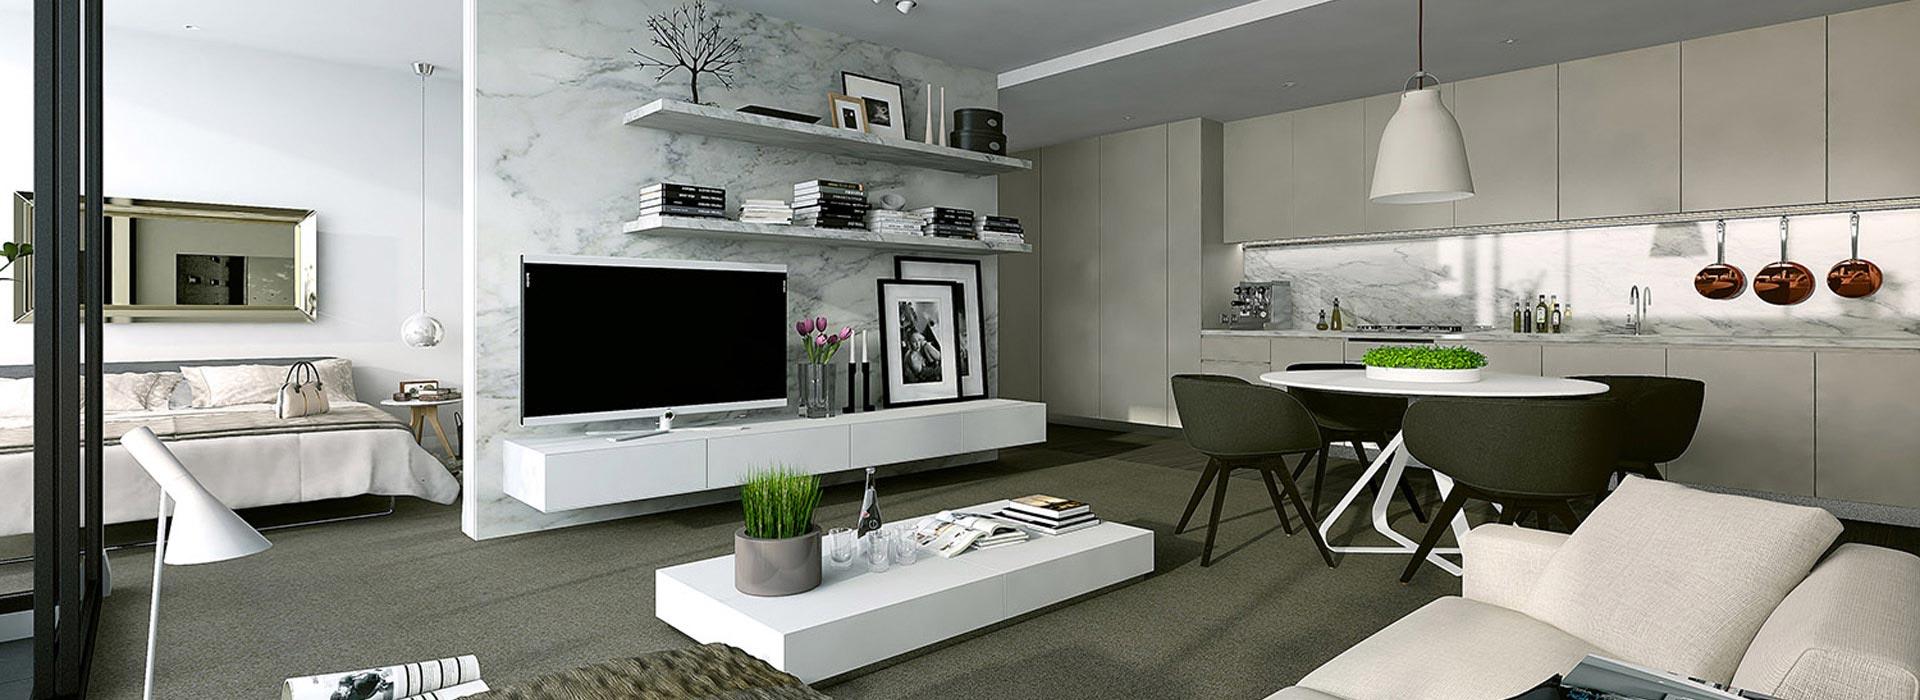 Comprehensive Property Services